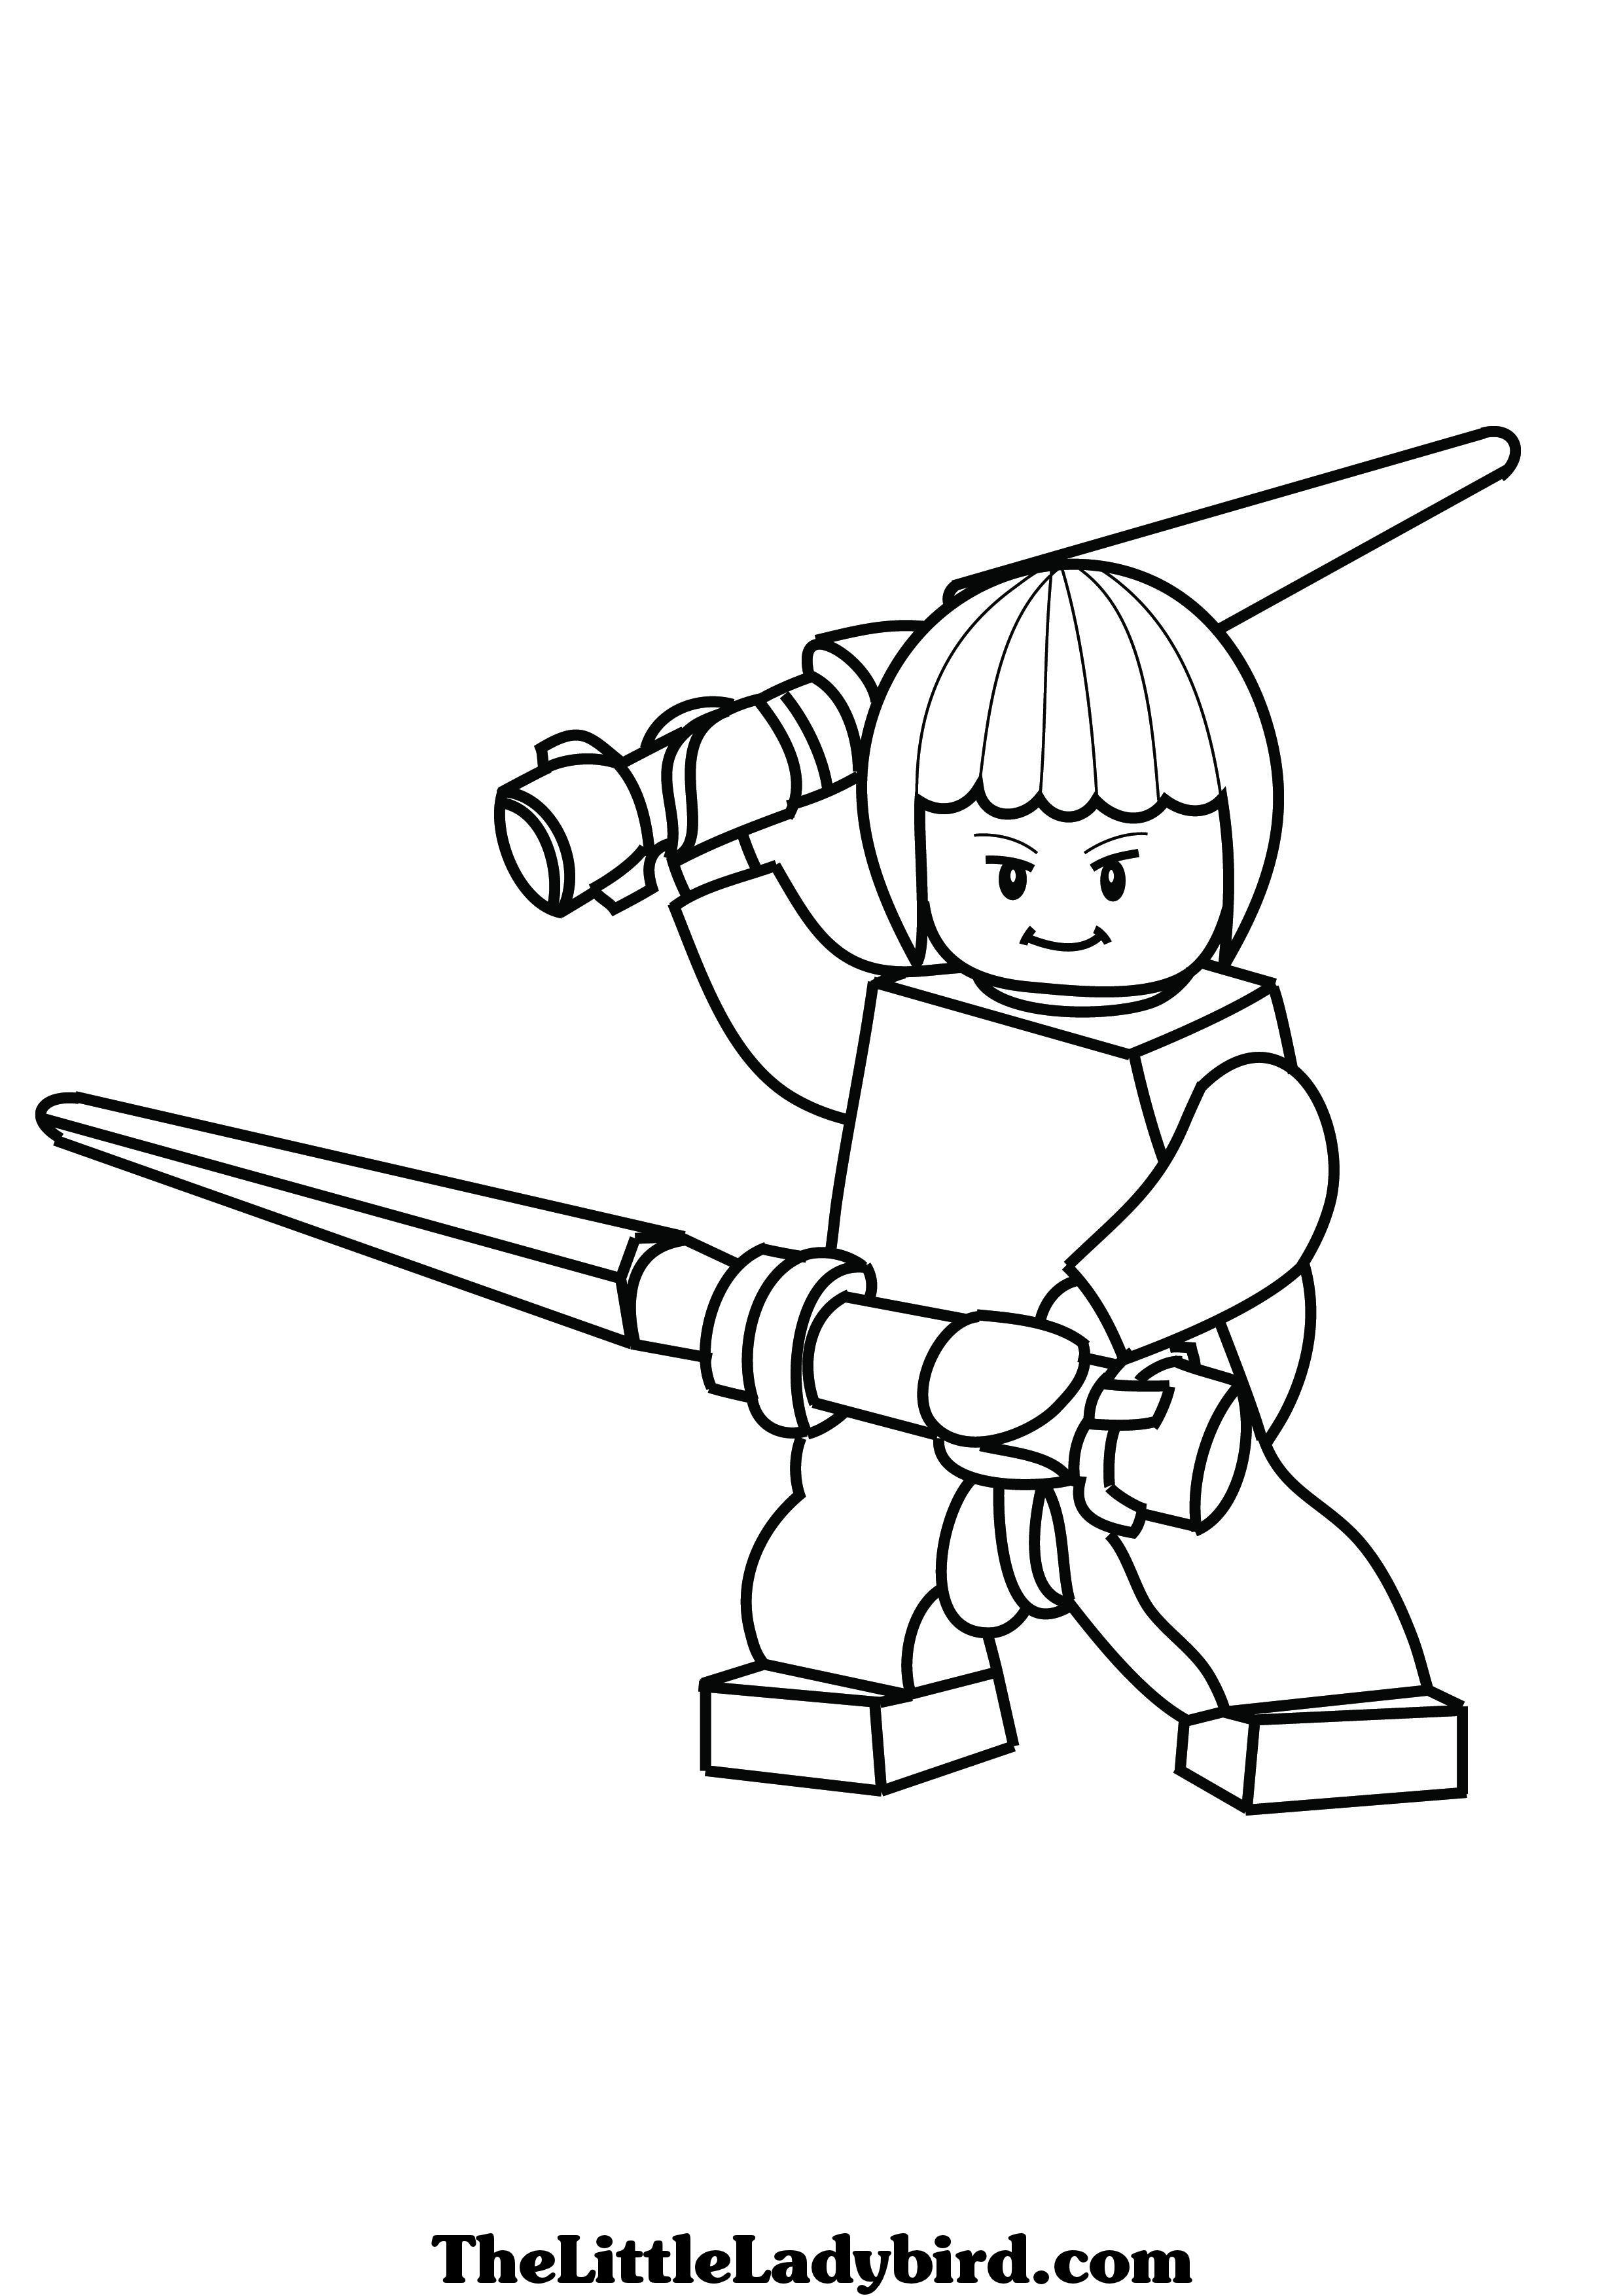 Lujoso Ninjago Para Colorear Gratis Imagen - Dibujos Para Colorear ...